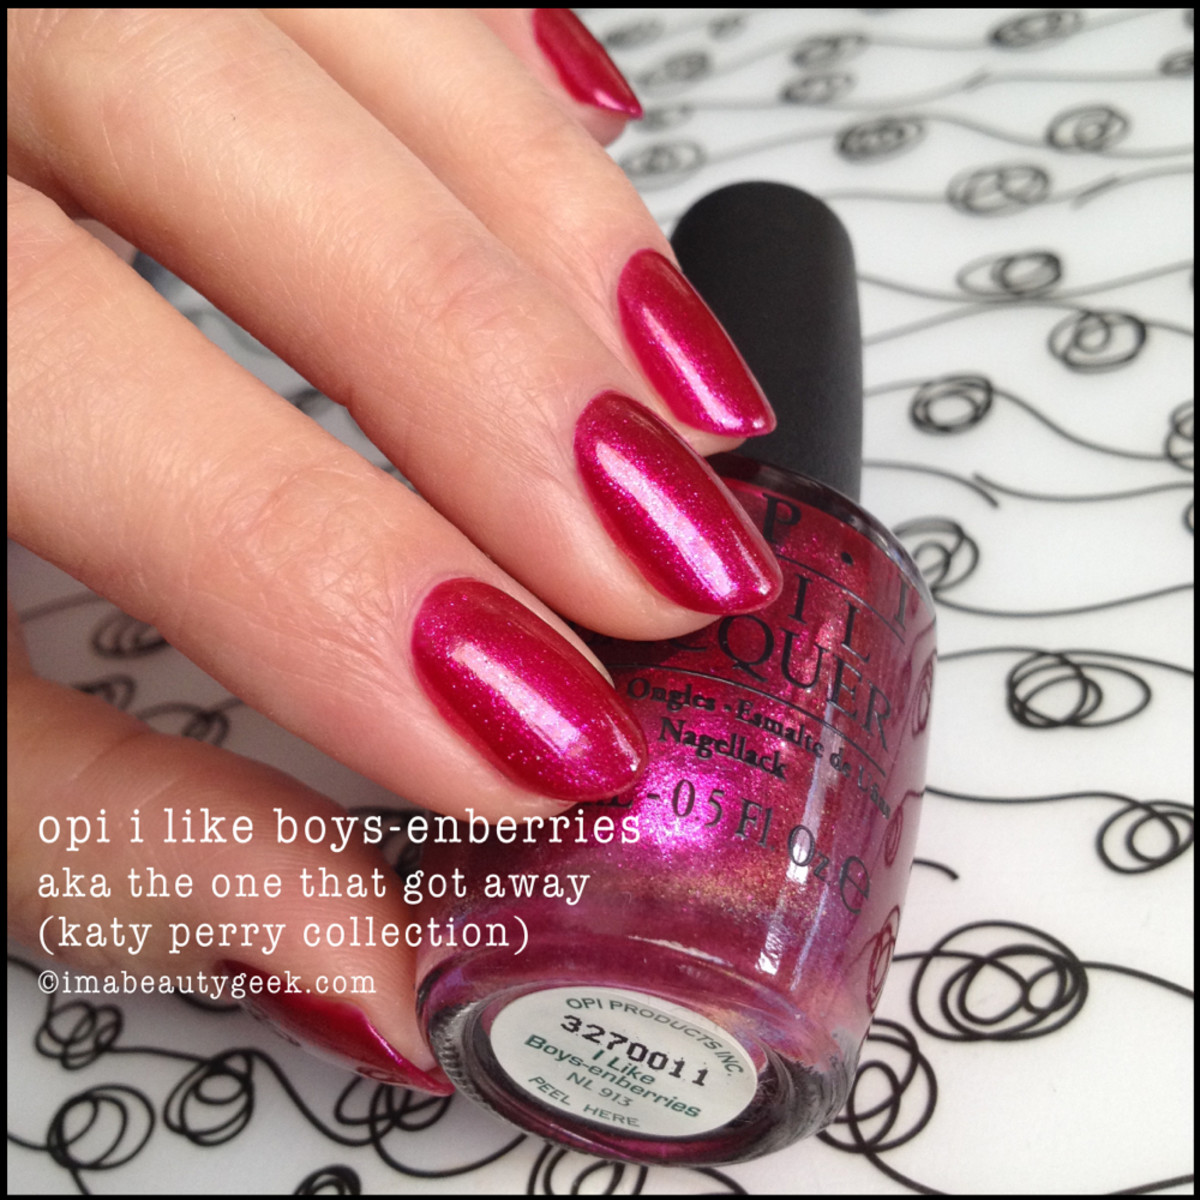 OPI I LIke Boys-Enberries Swatch